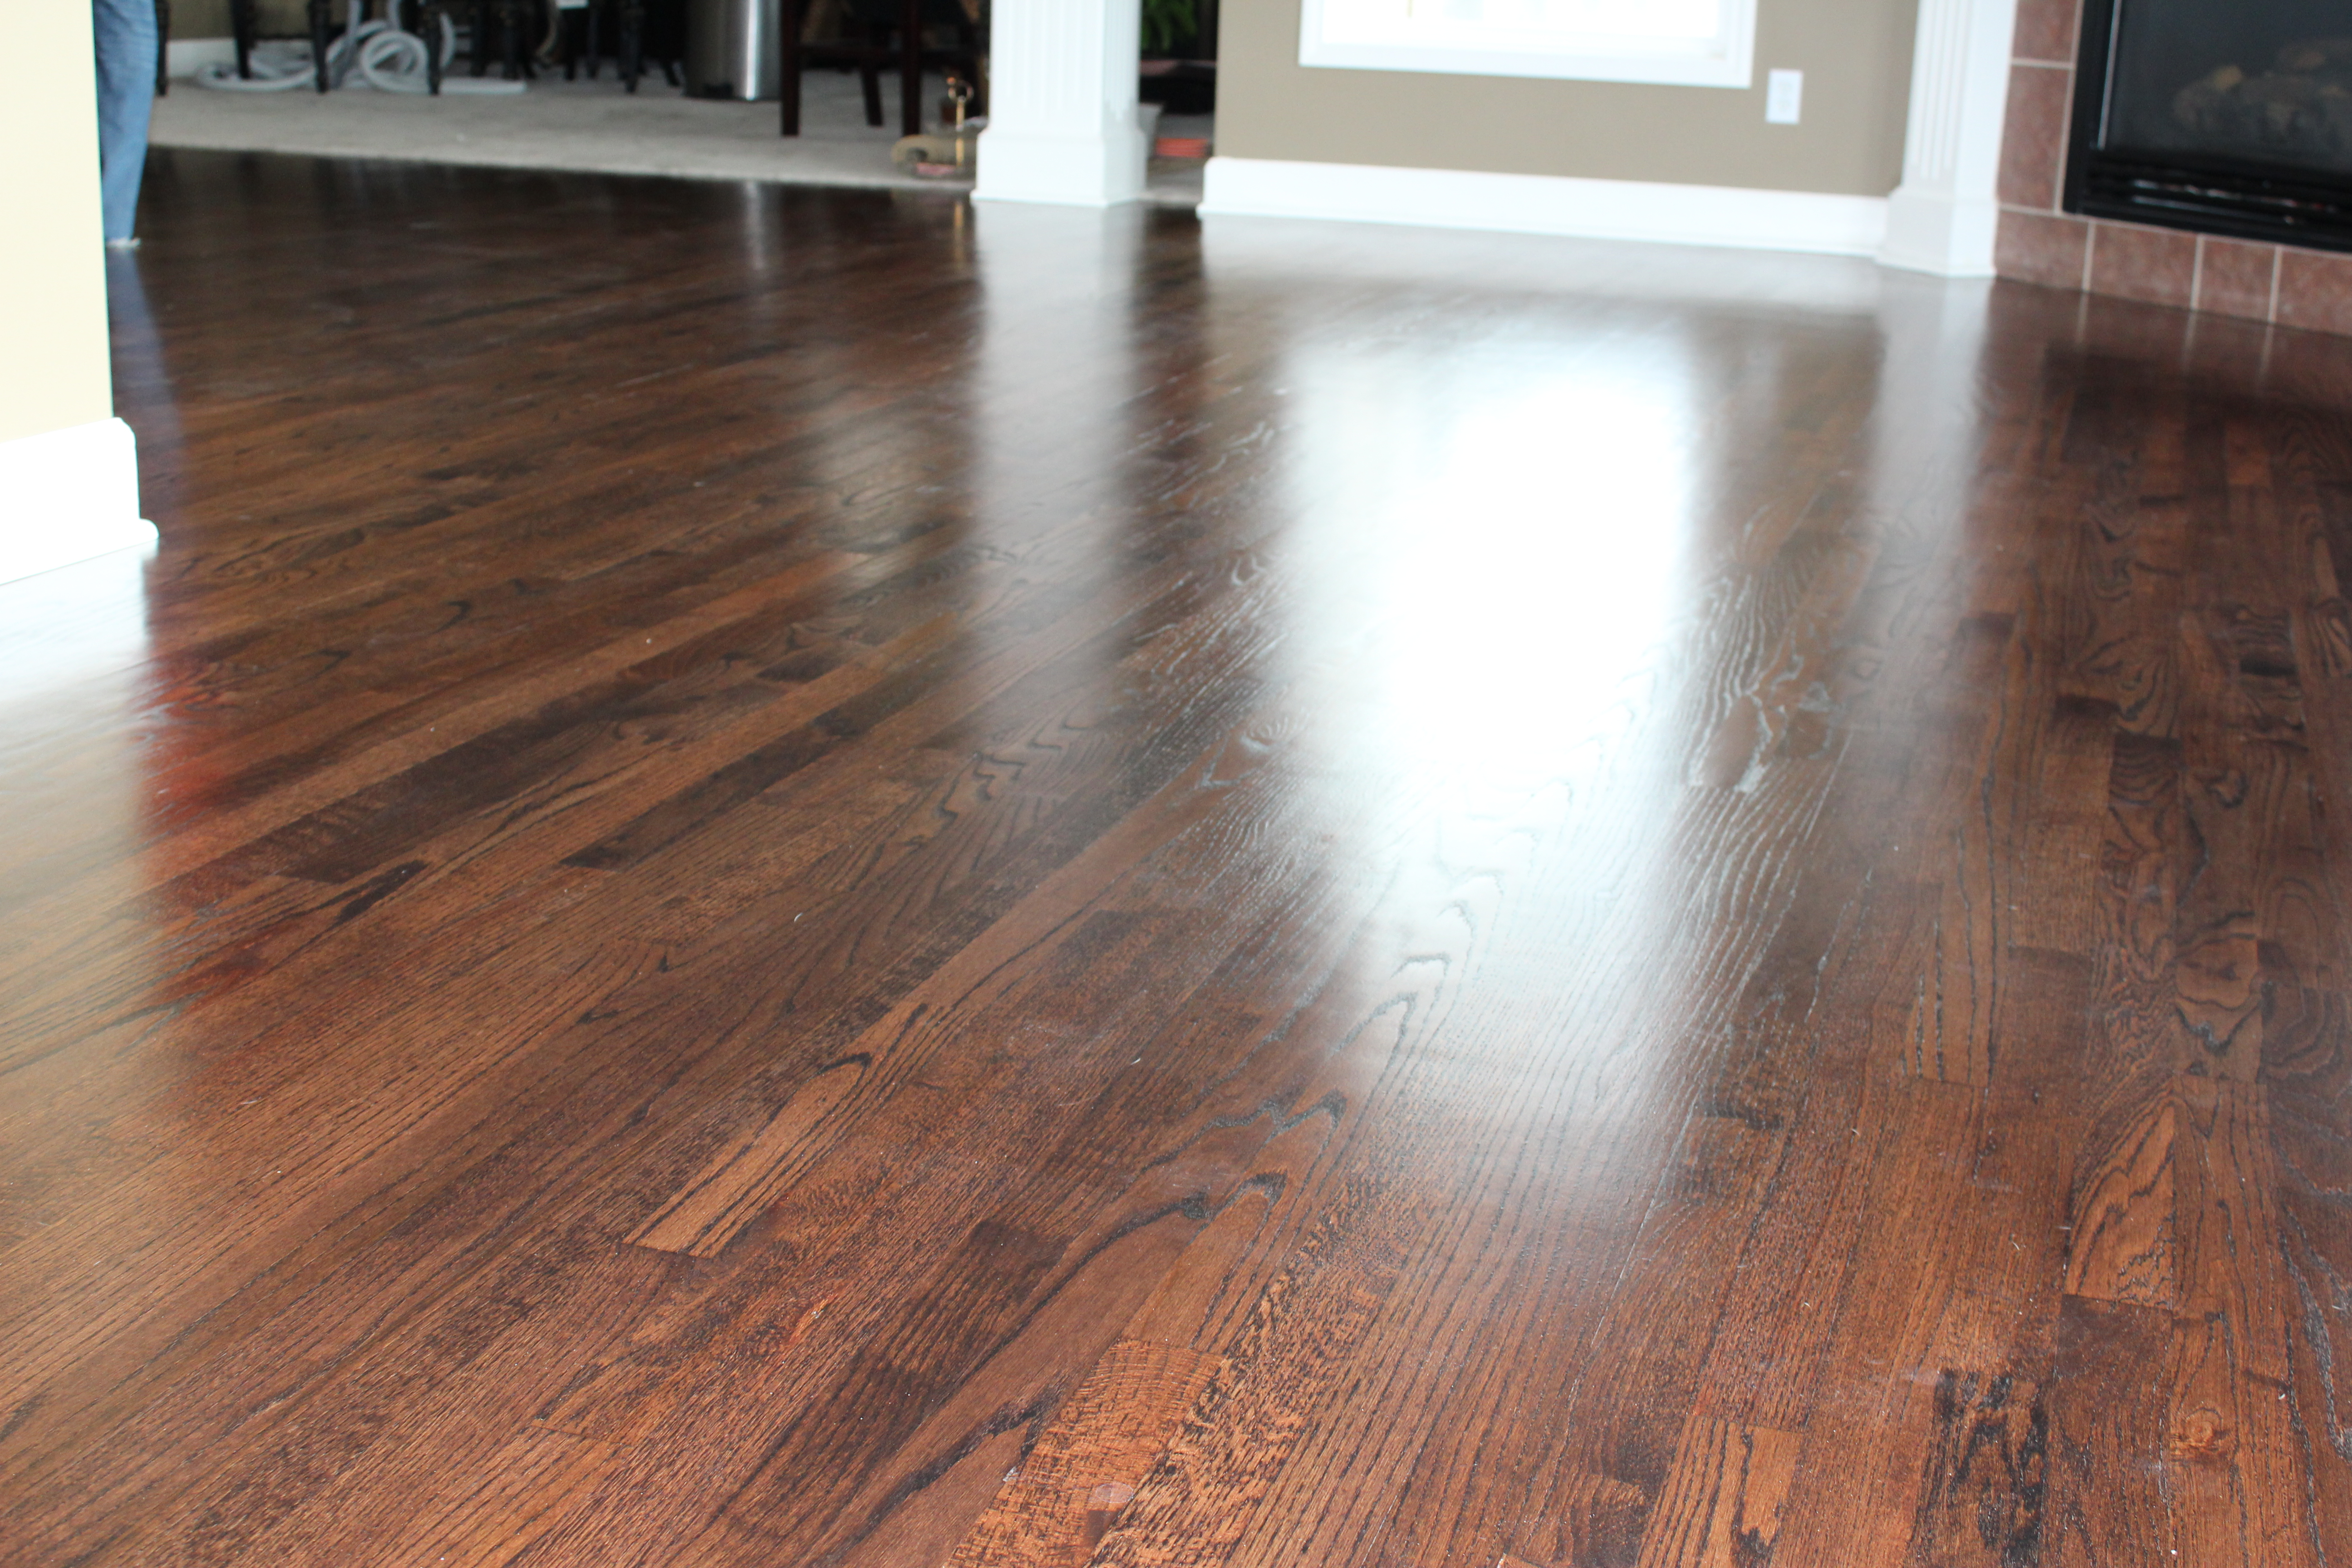 Mahogany hardwood floor lee s summit mo rippnfinish for Missouri hardwood flooring